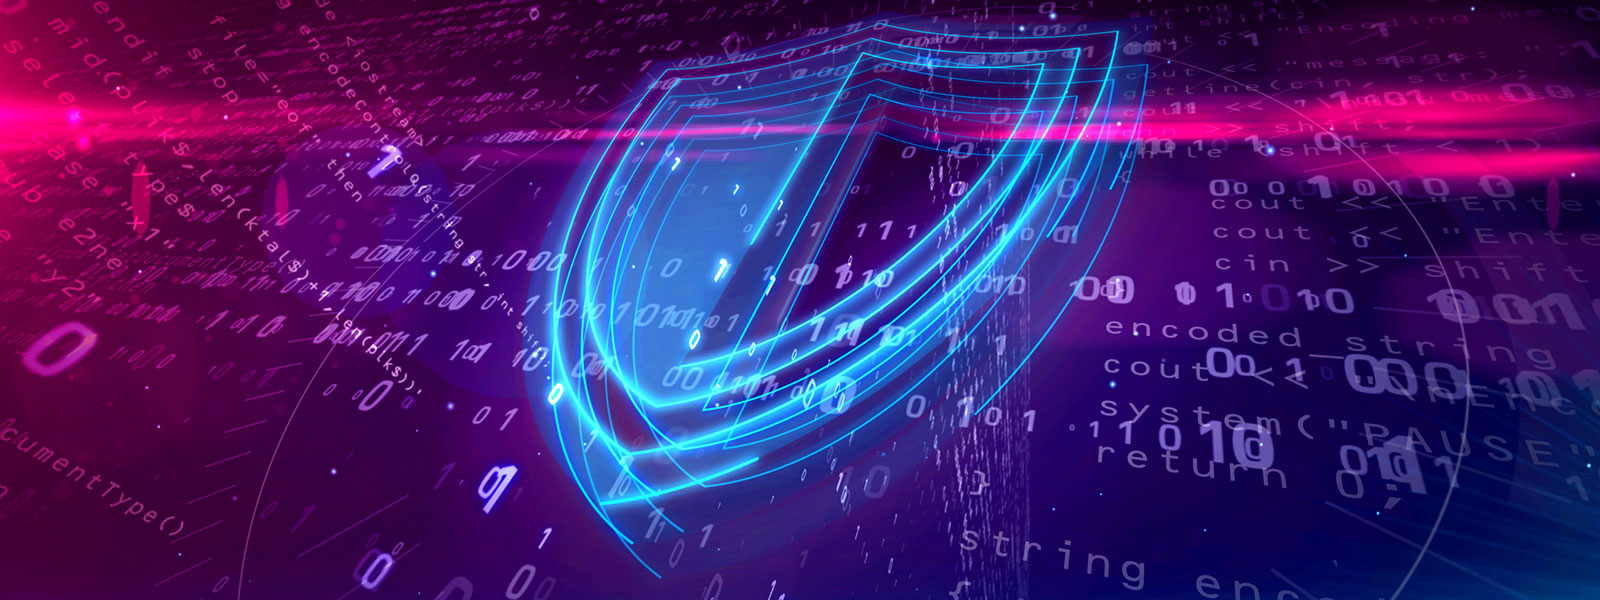 WPS Hide Login for Added WordPress Security